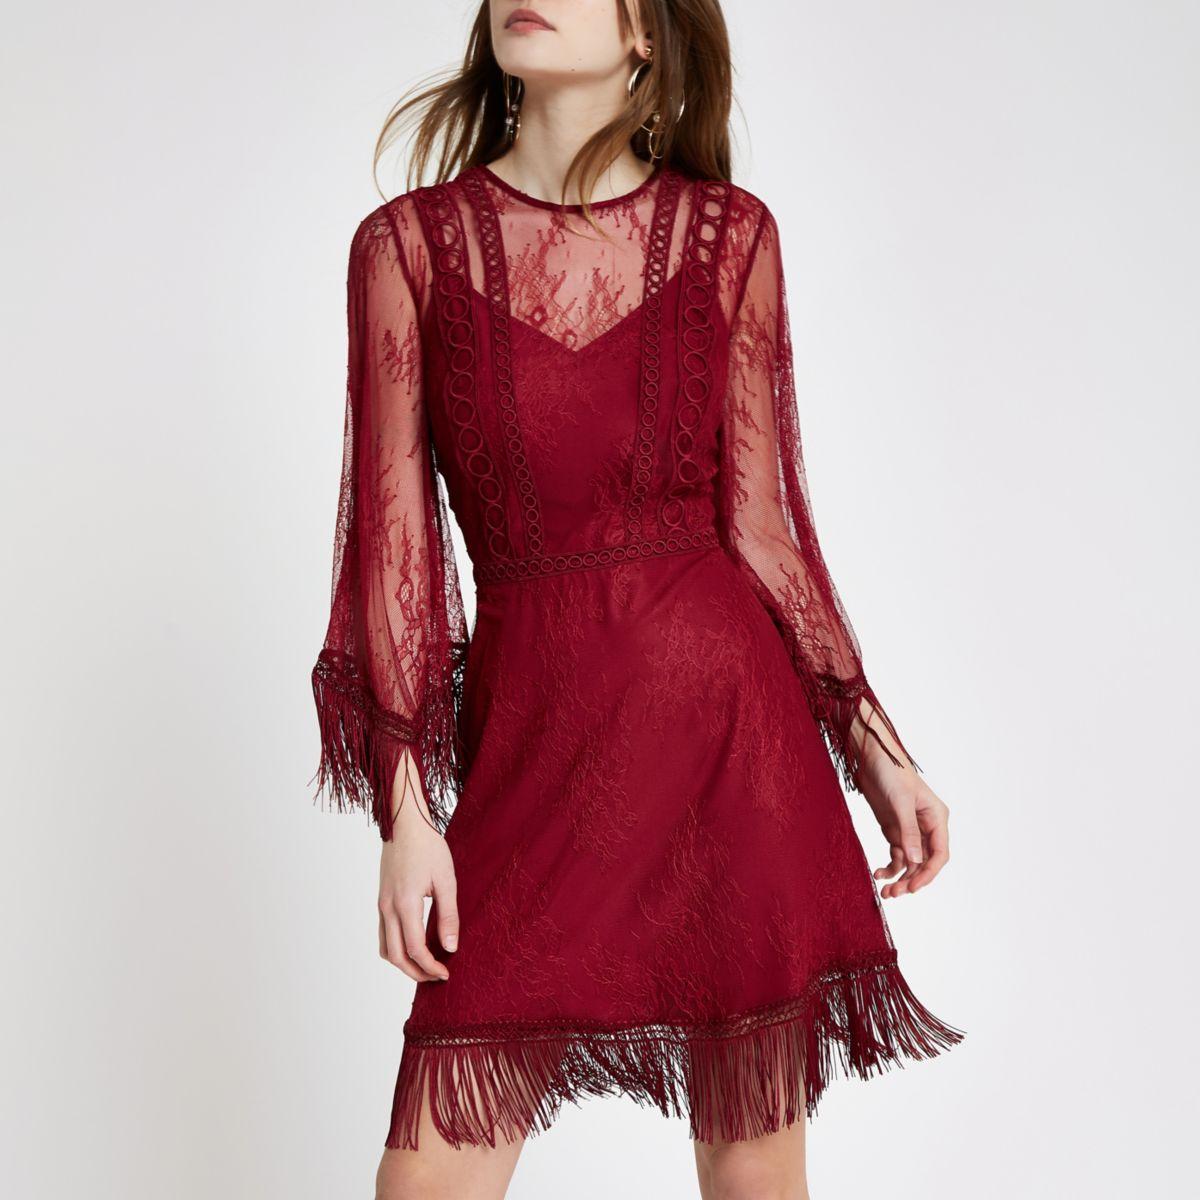 Dark red mesh lace fringe occasion dress